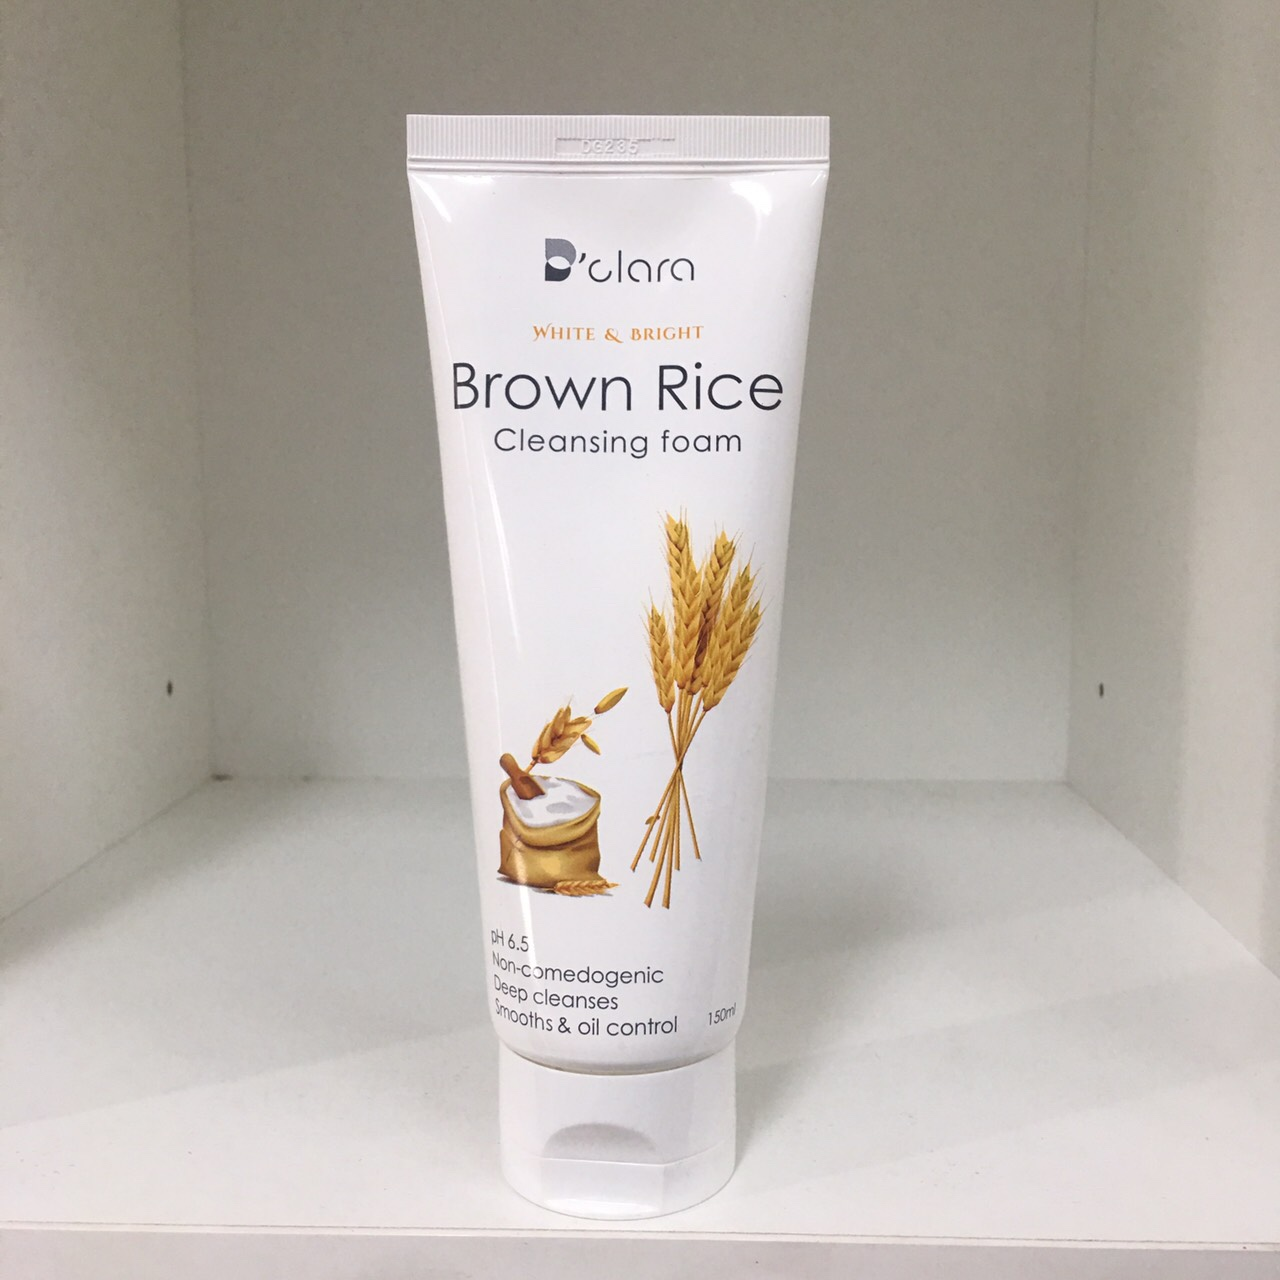 Brown rice cleansing foam